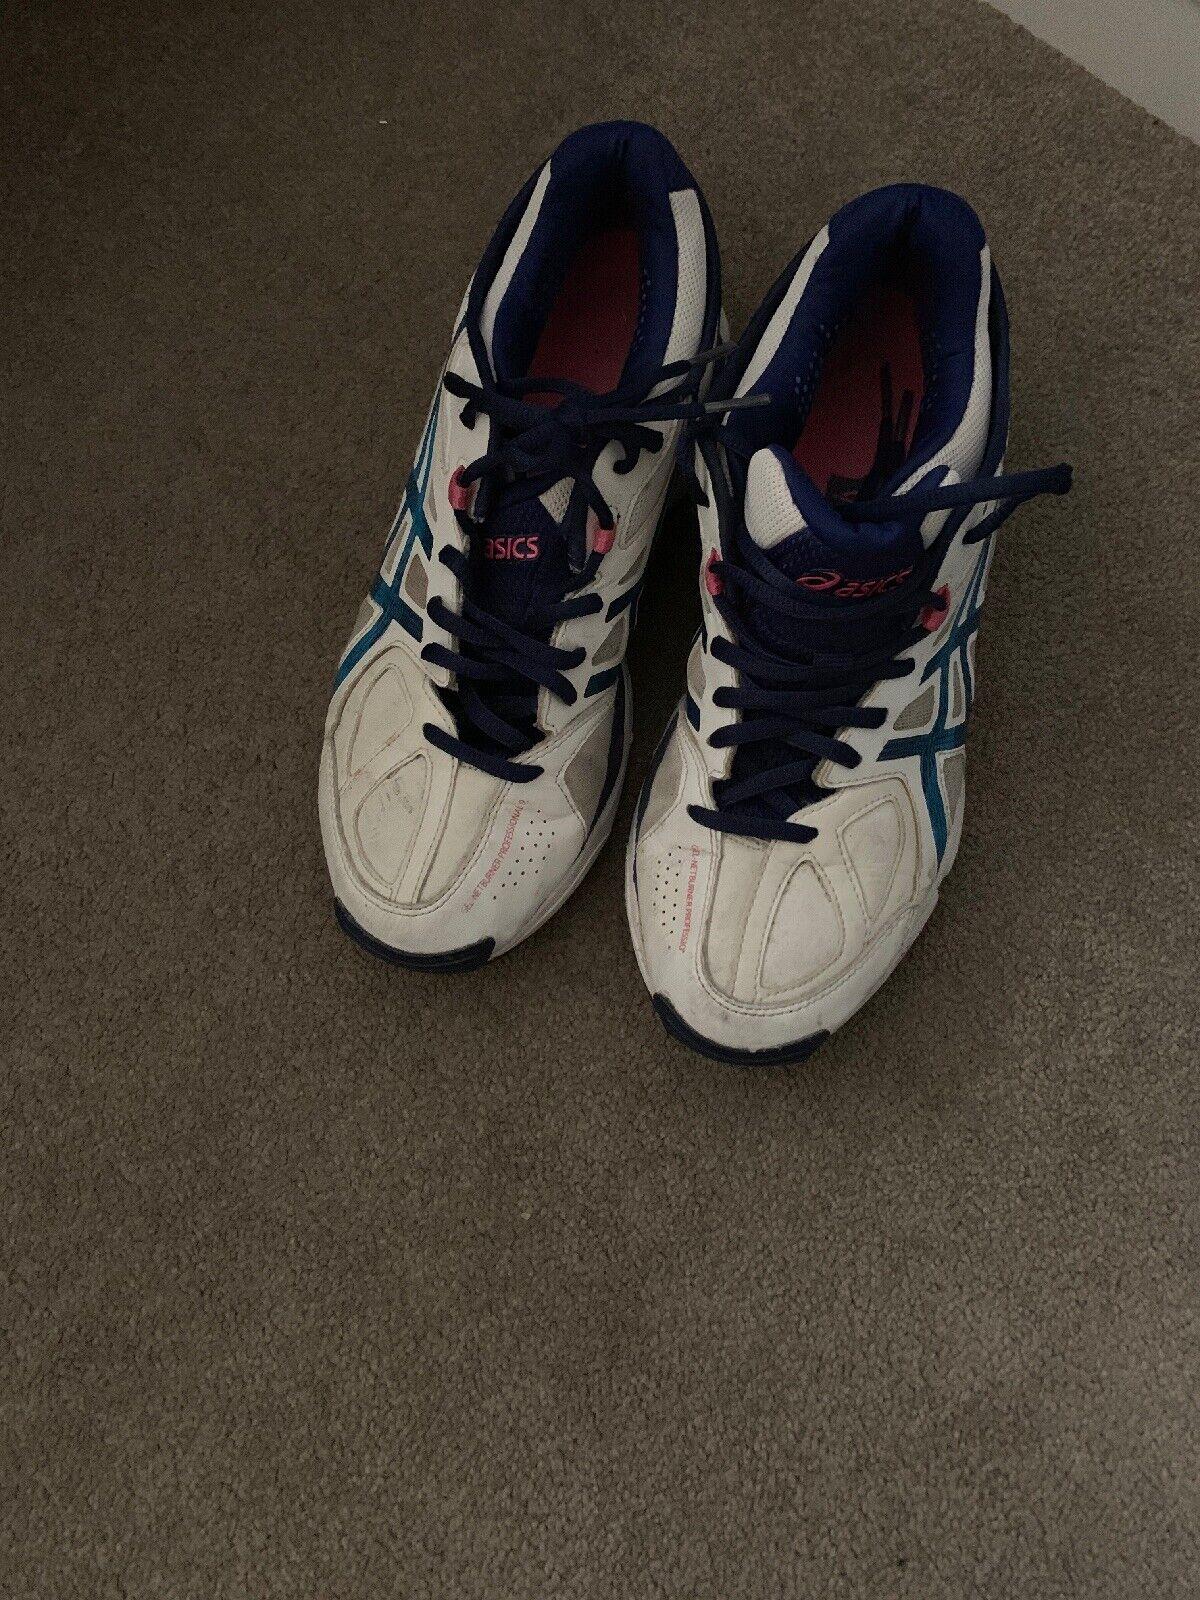 89d5126317 Asics Gel Netburner Profesional blancoo Netball Zapatillas Zapatos Talla  UK7 EU40.5 9 ntgayt3085-Zapatillas deportivas